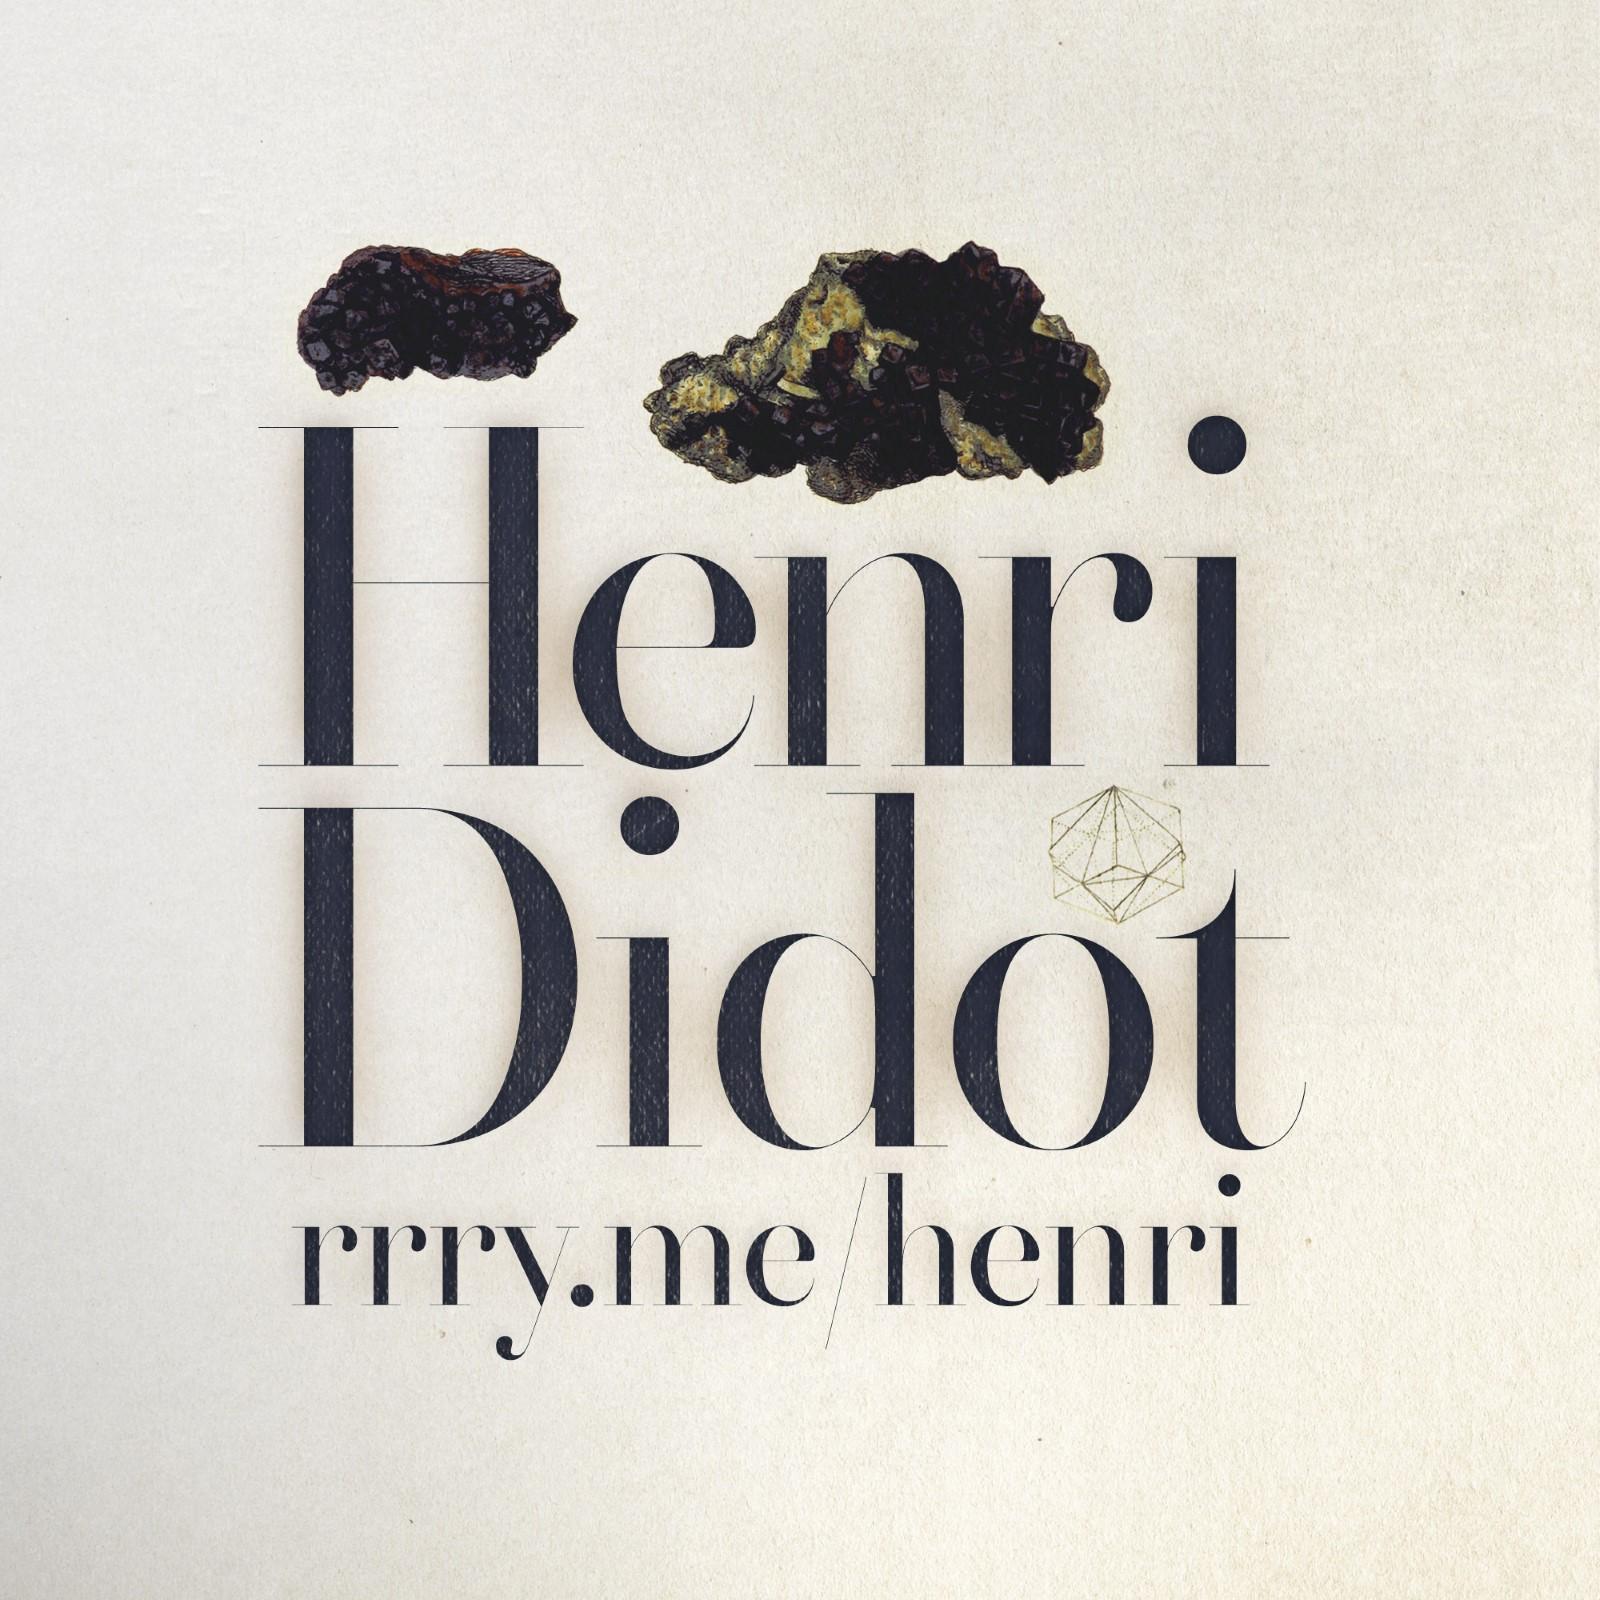 henri1 (Custom)